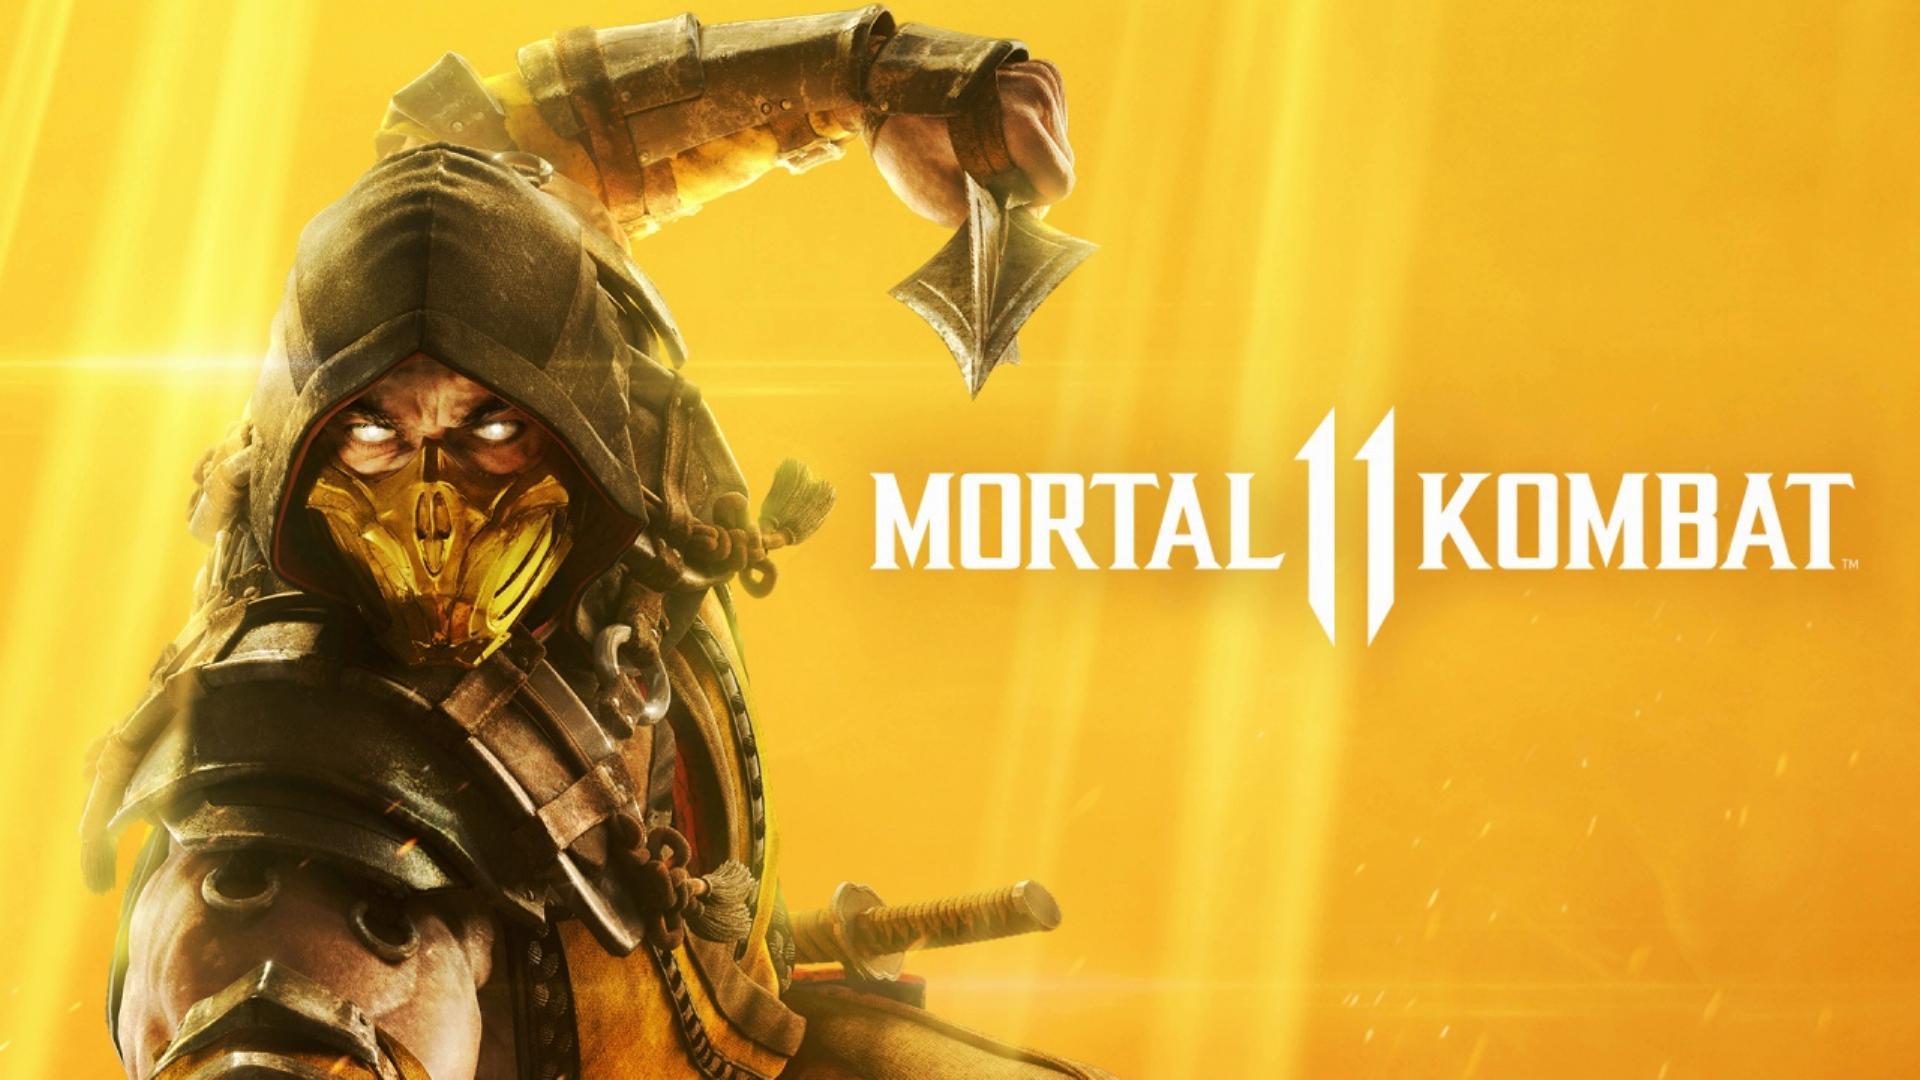 mortal kombat 11 wallpaper raiden